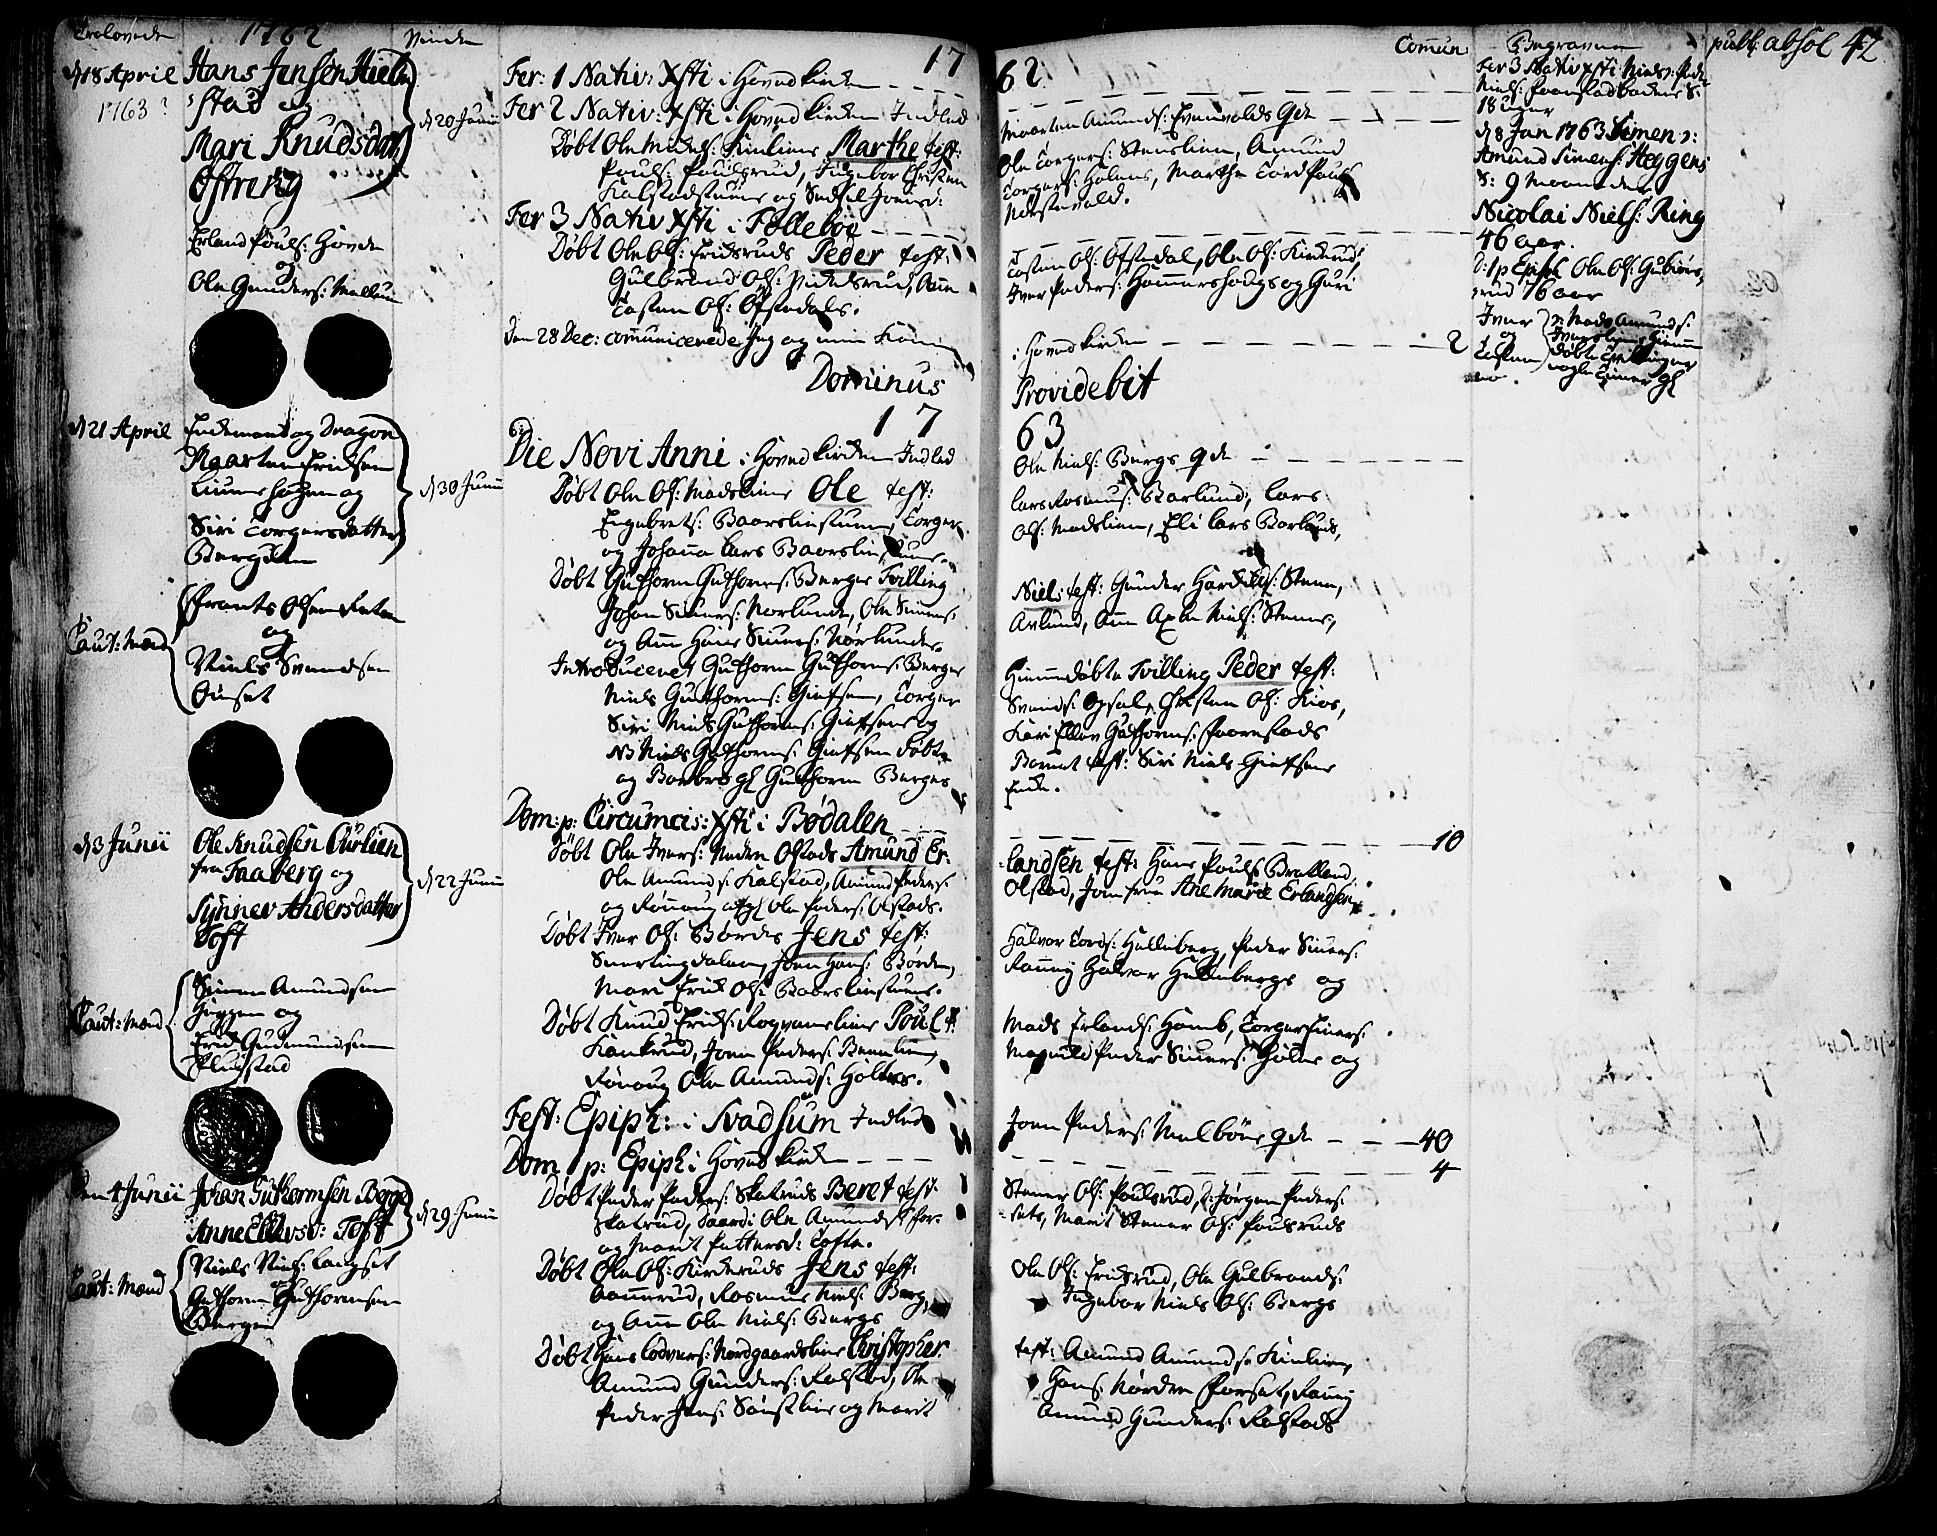 SAH, Gausdal prestekontor, Ministerialbok nr. 3, 1758-1809, s. 42